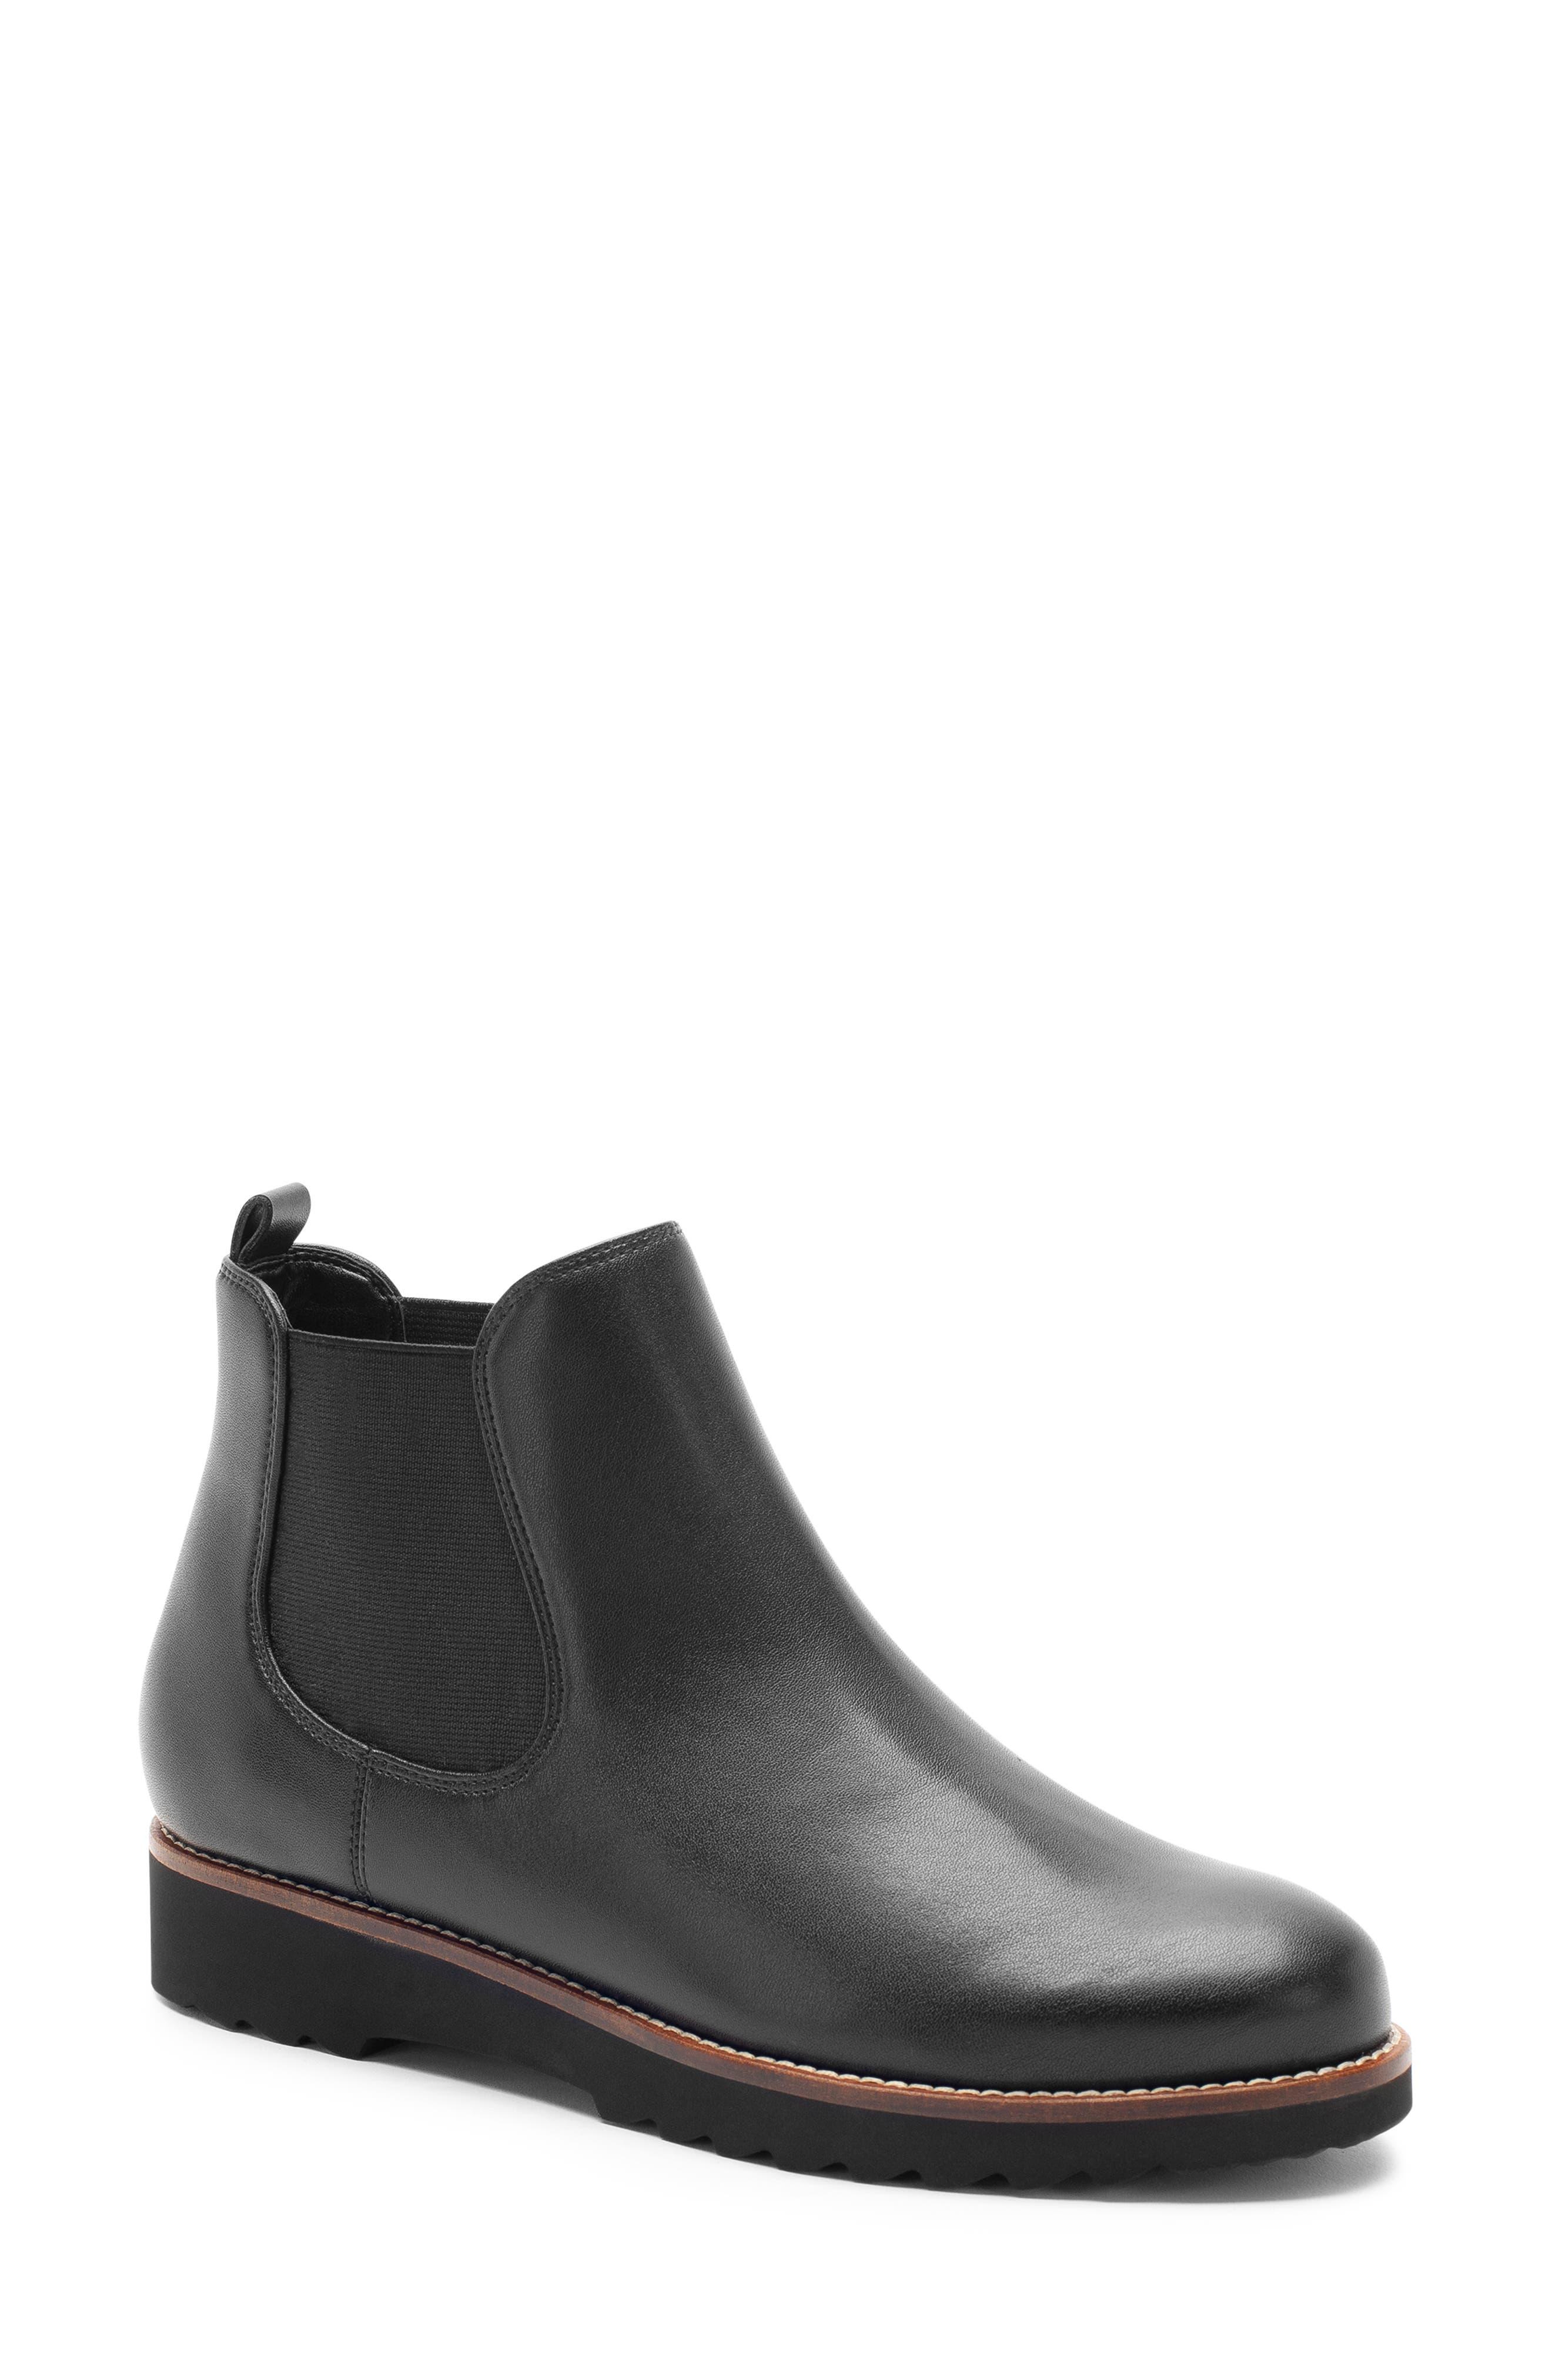 Roman Waterproof Bootie,                             Main thumbnail 1, color,                             Black Leather